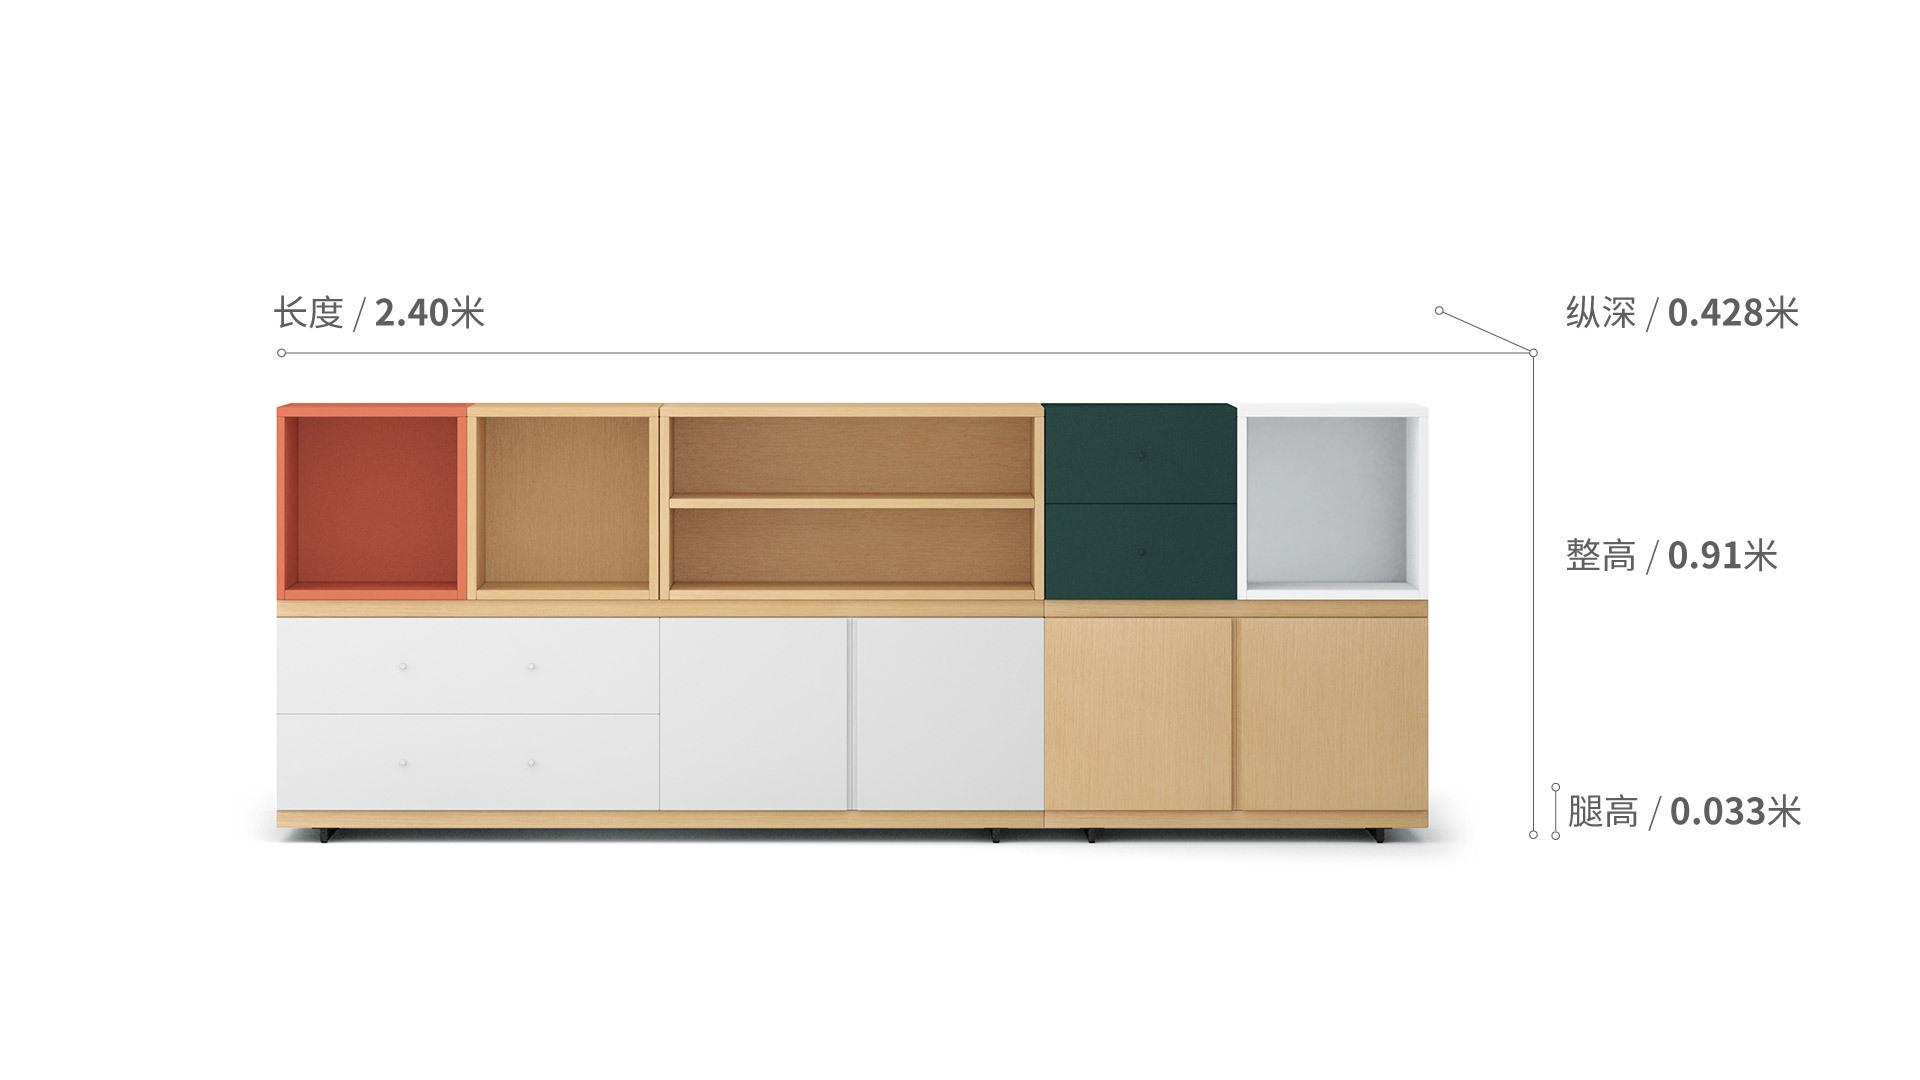 COSMO星格™置物柜2.4米宽置物柜柜架效果图